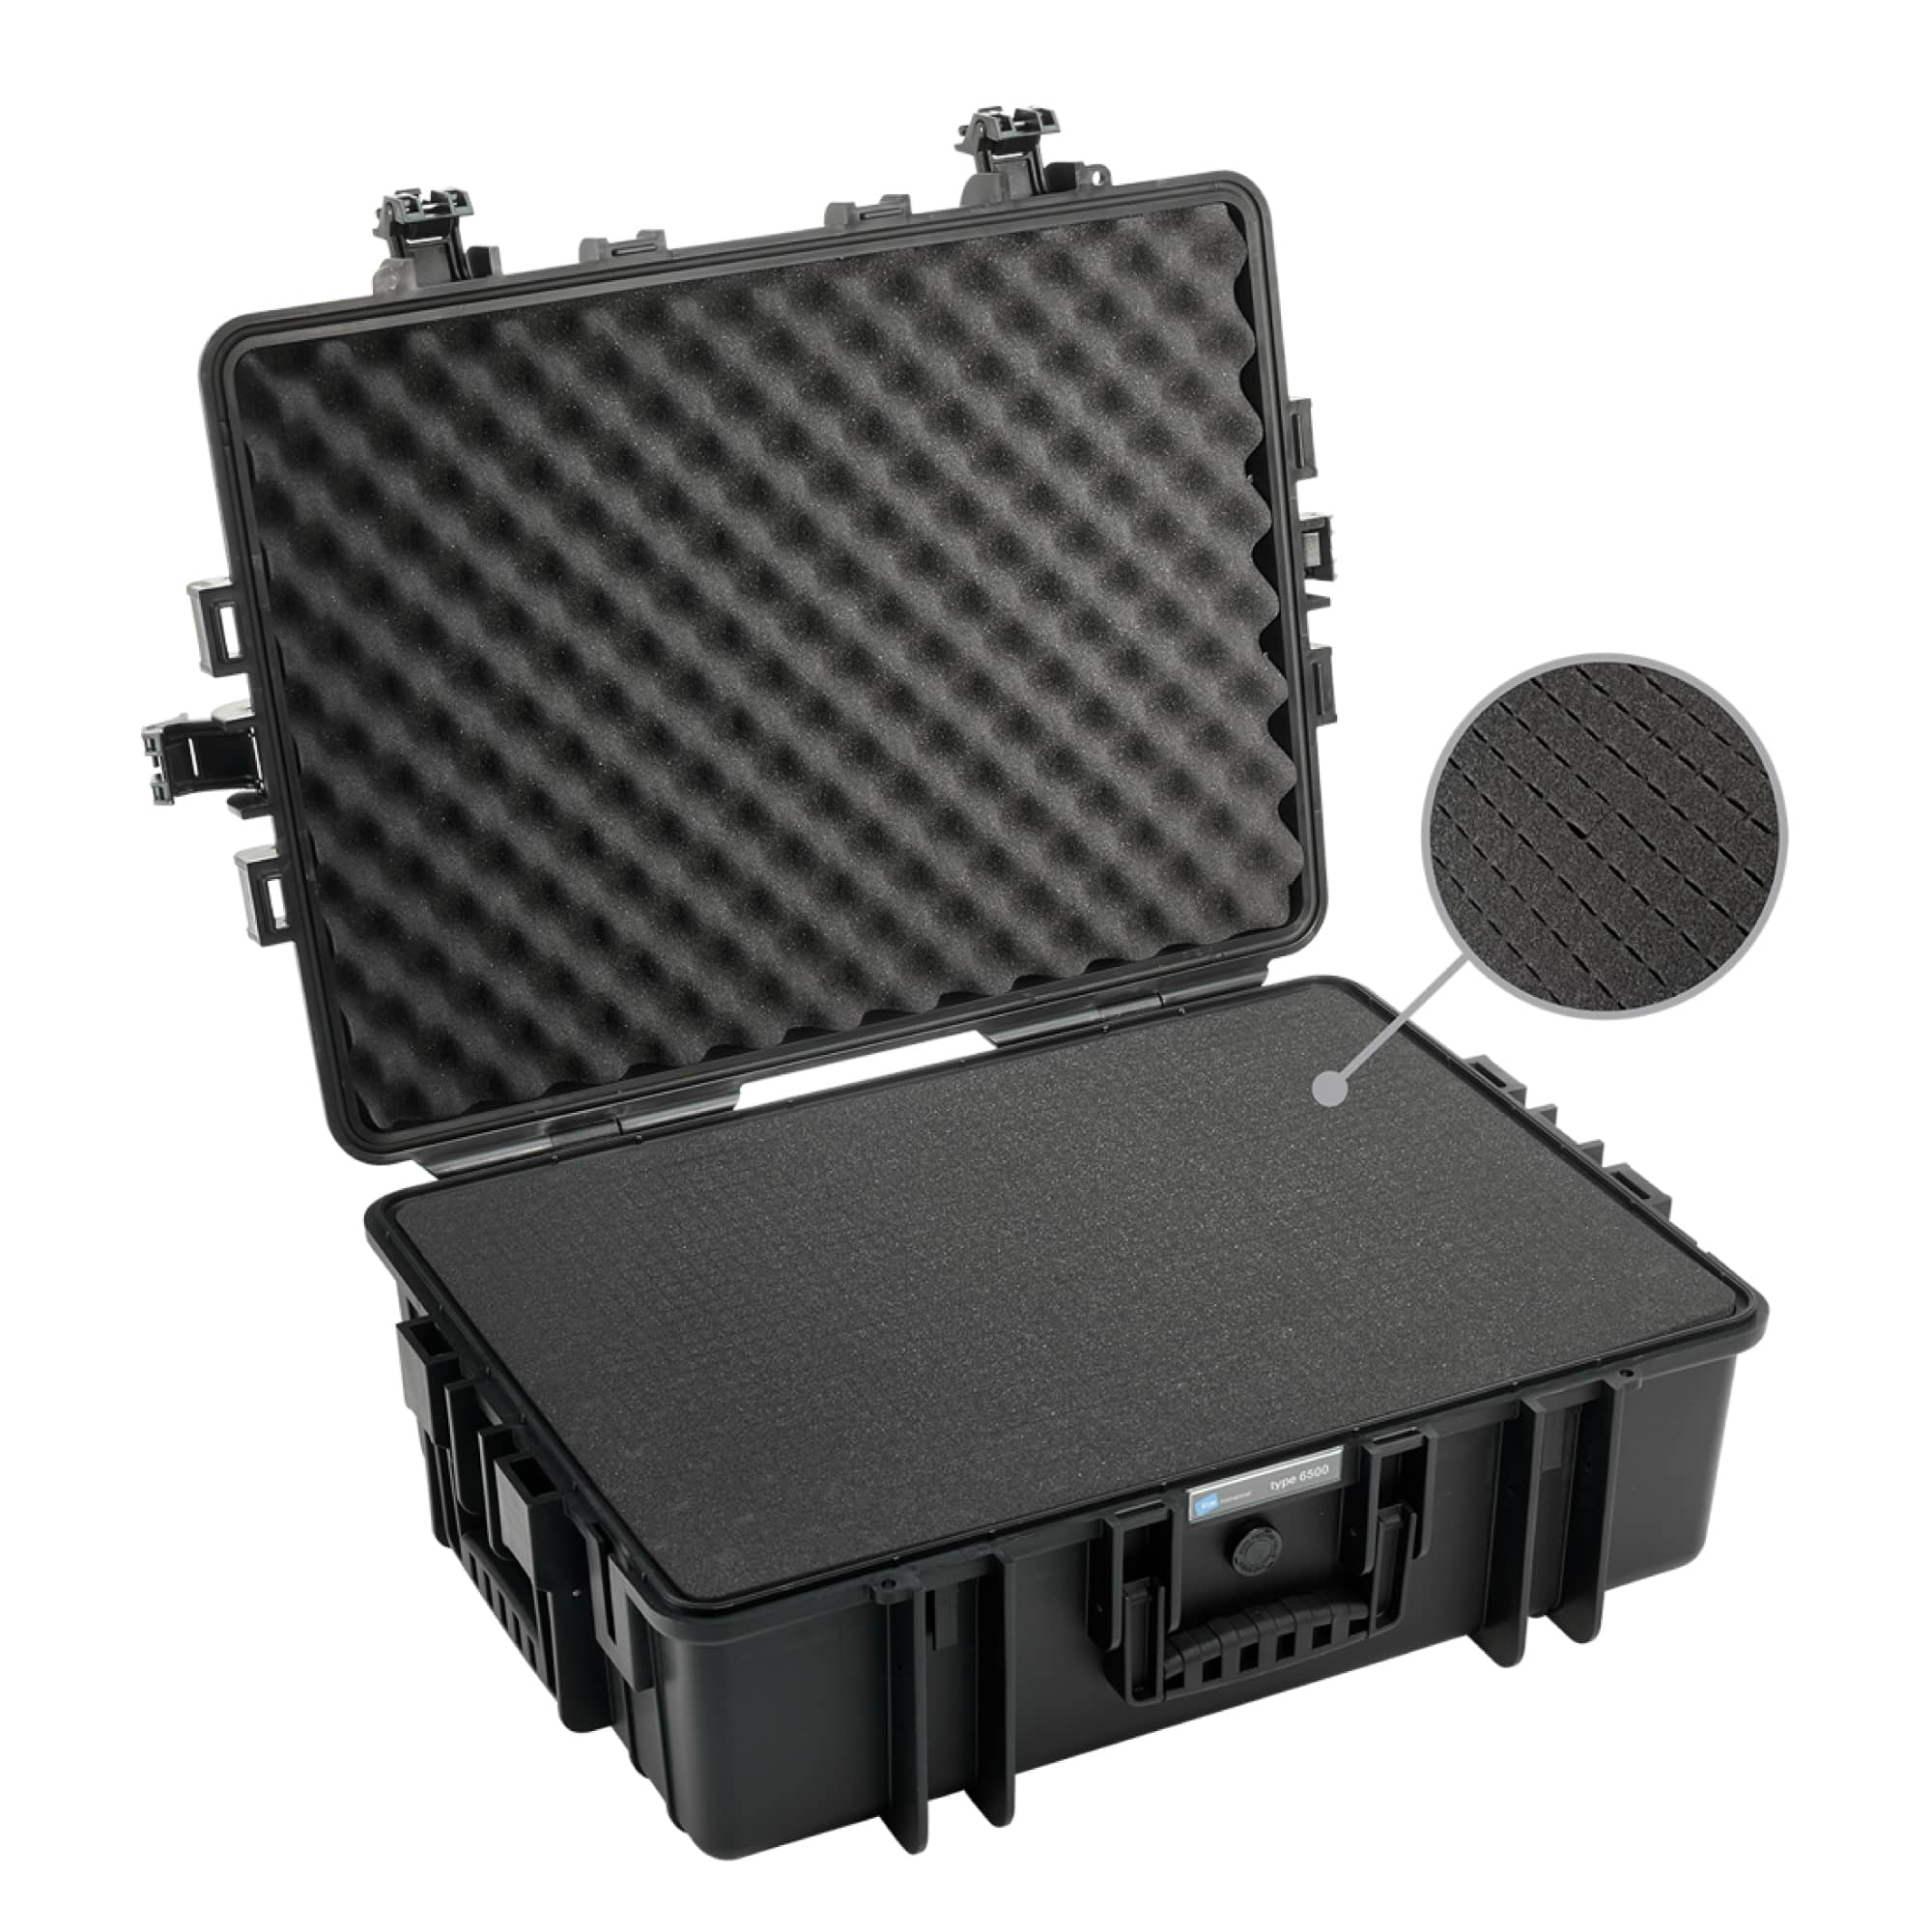 B&W Outdoor Case Typ 6500 black with pre-cut foam (SI)